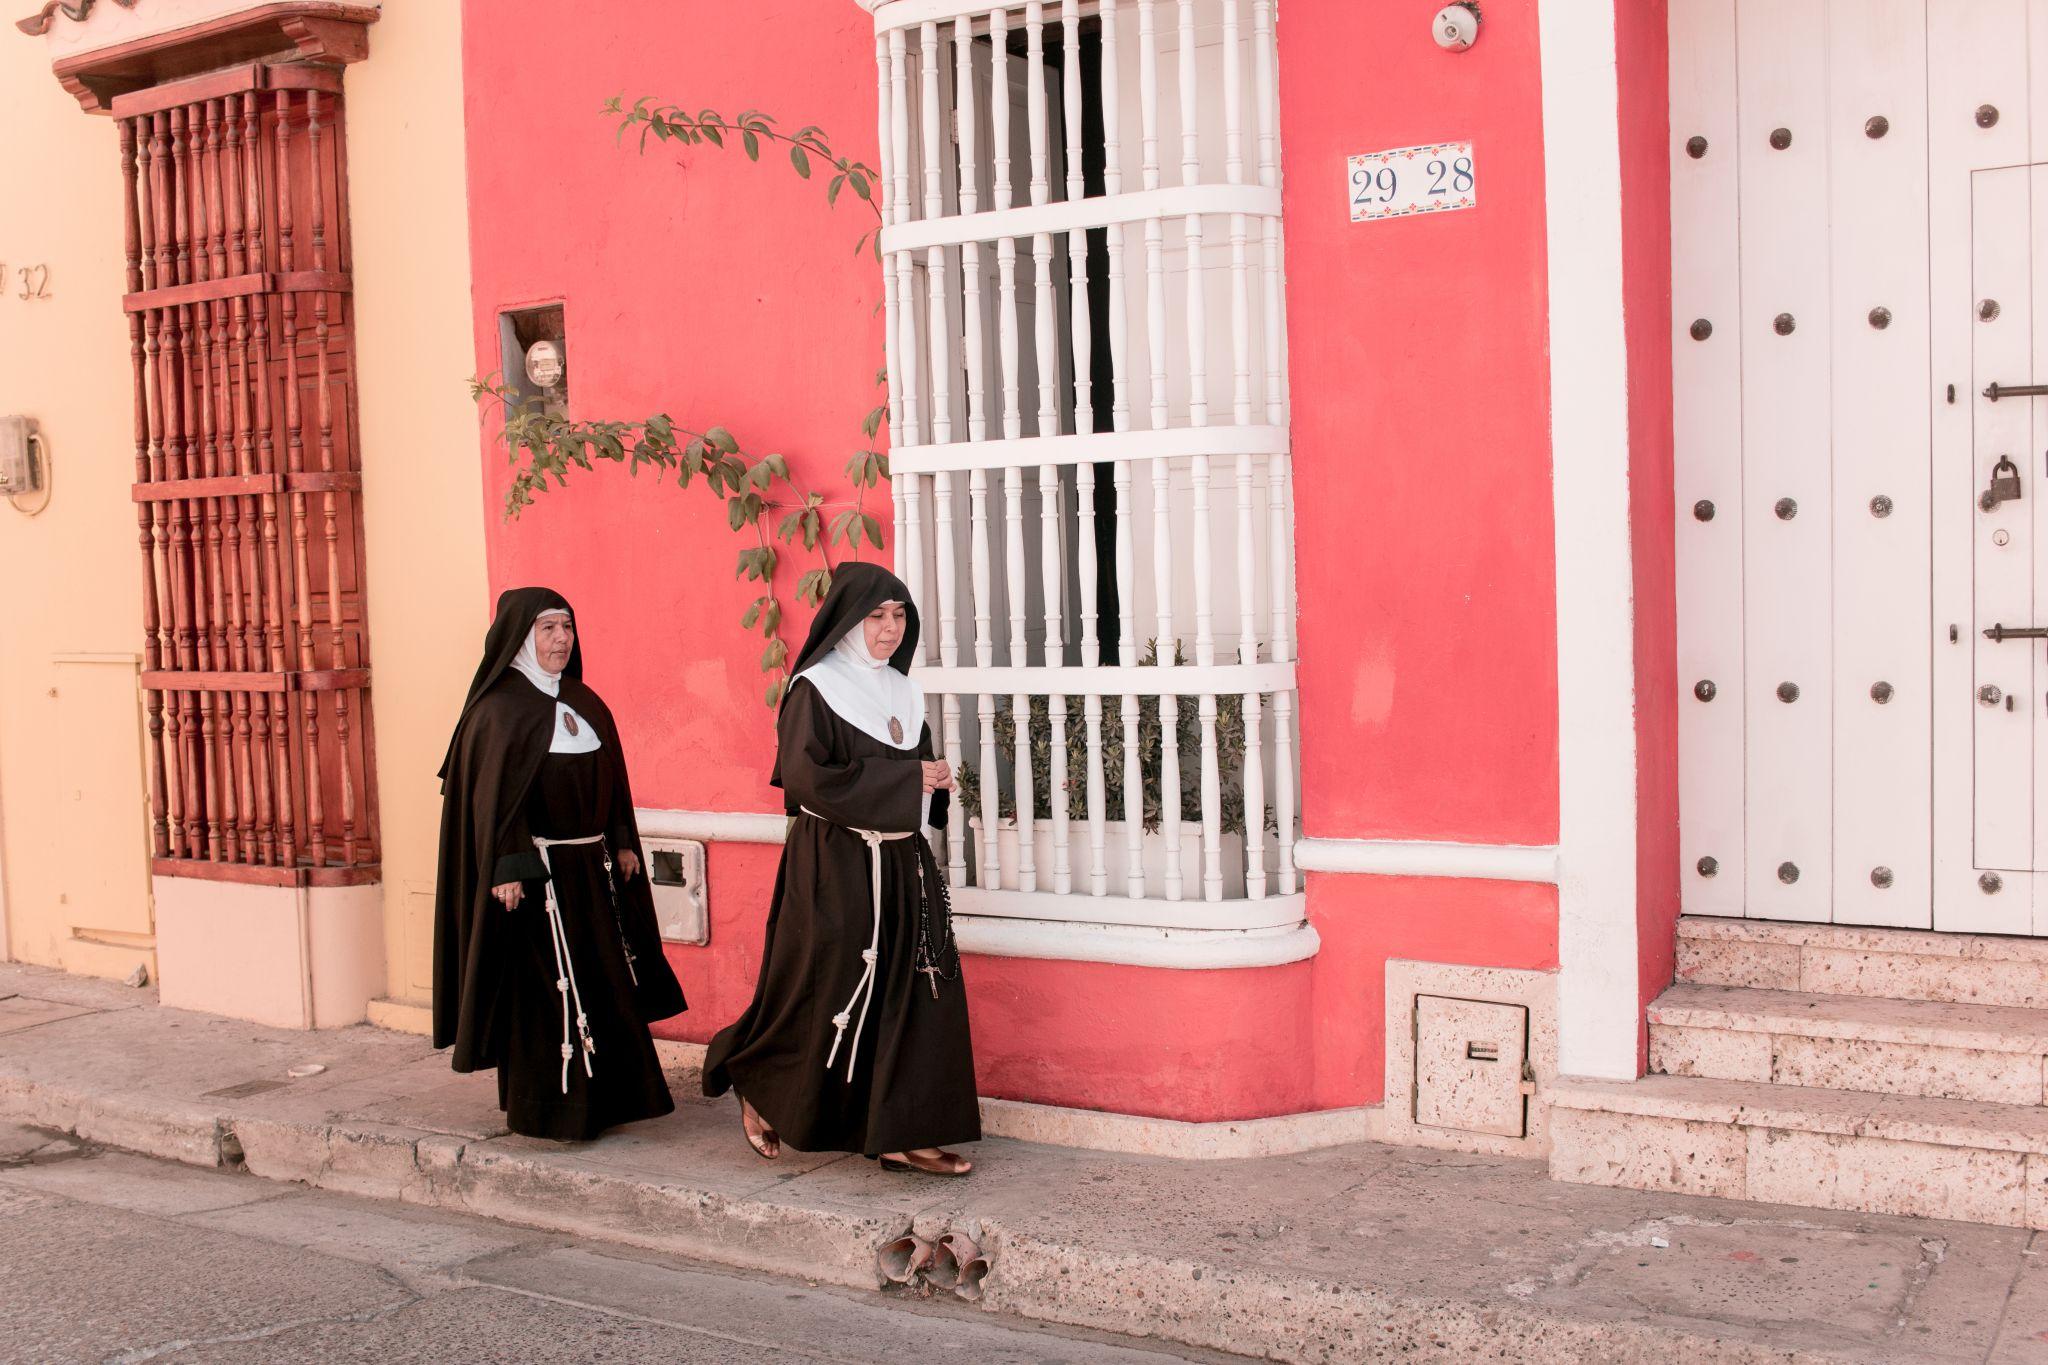 Cartagena Getsemani Colombia nuns